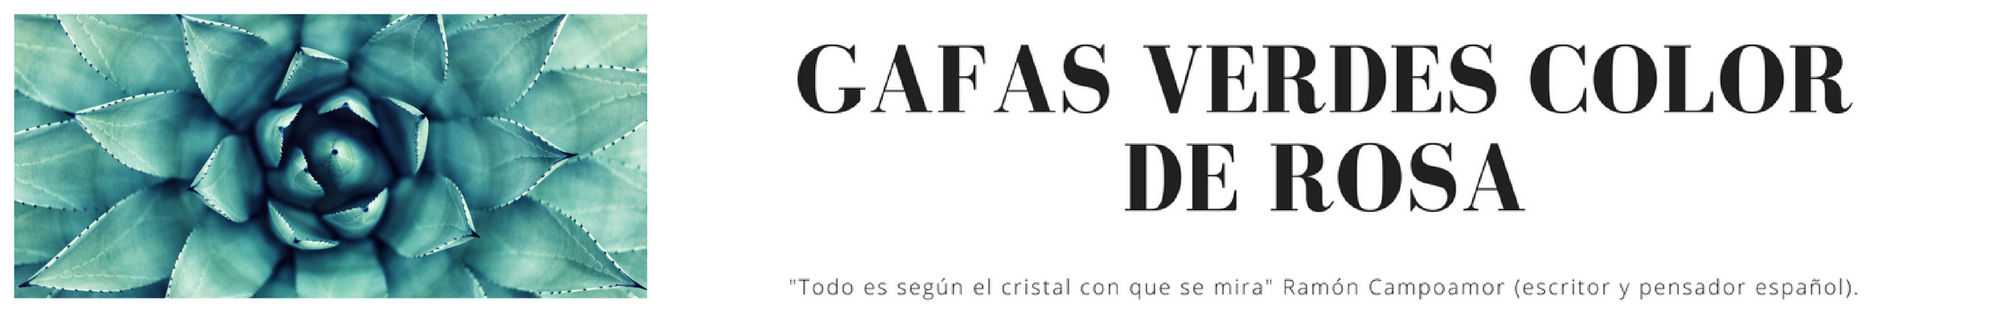 Un blog escrito por Helenidad Piña.